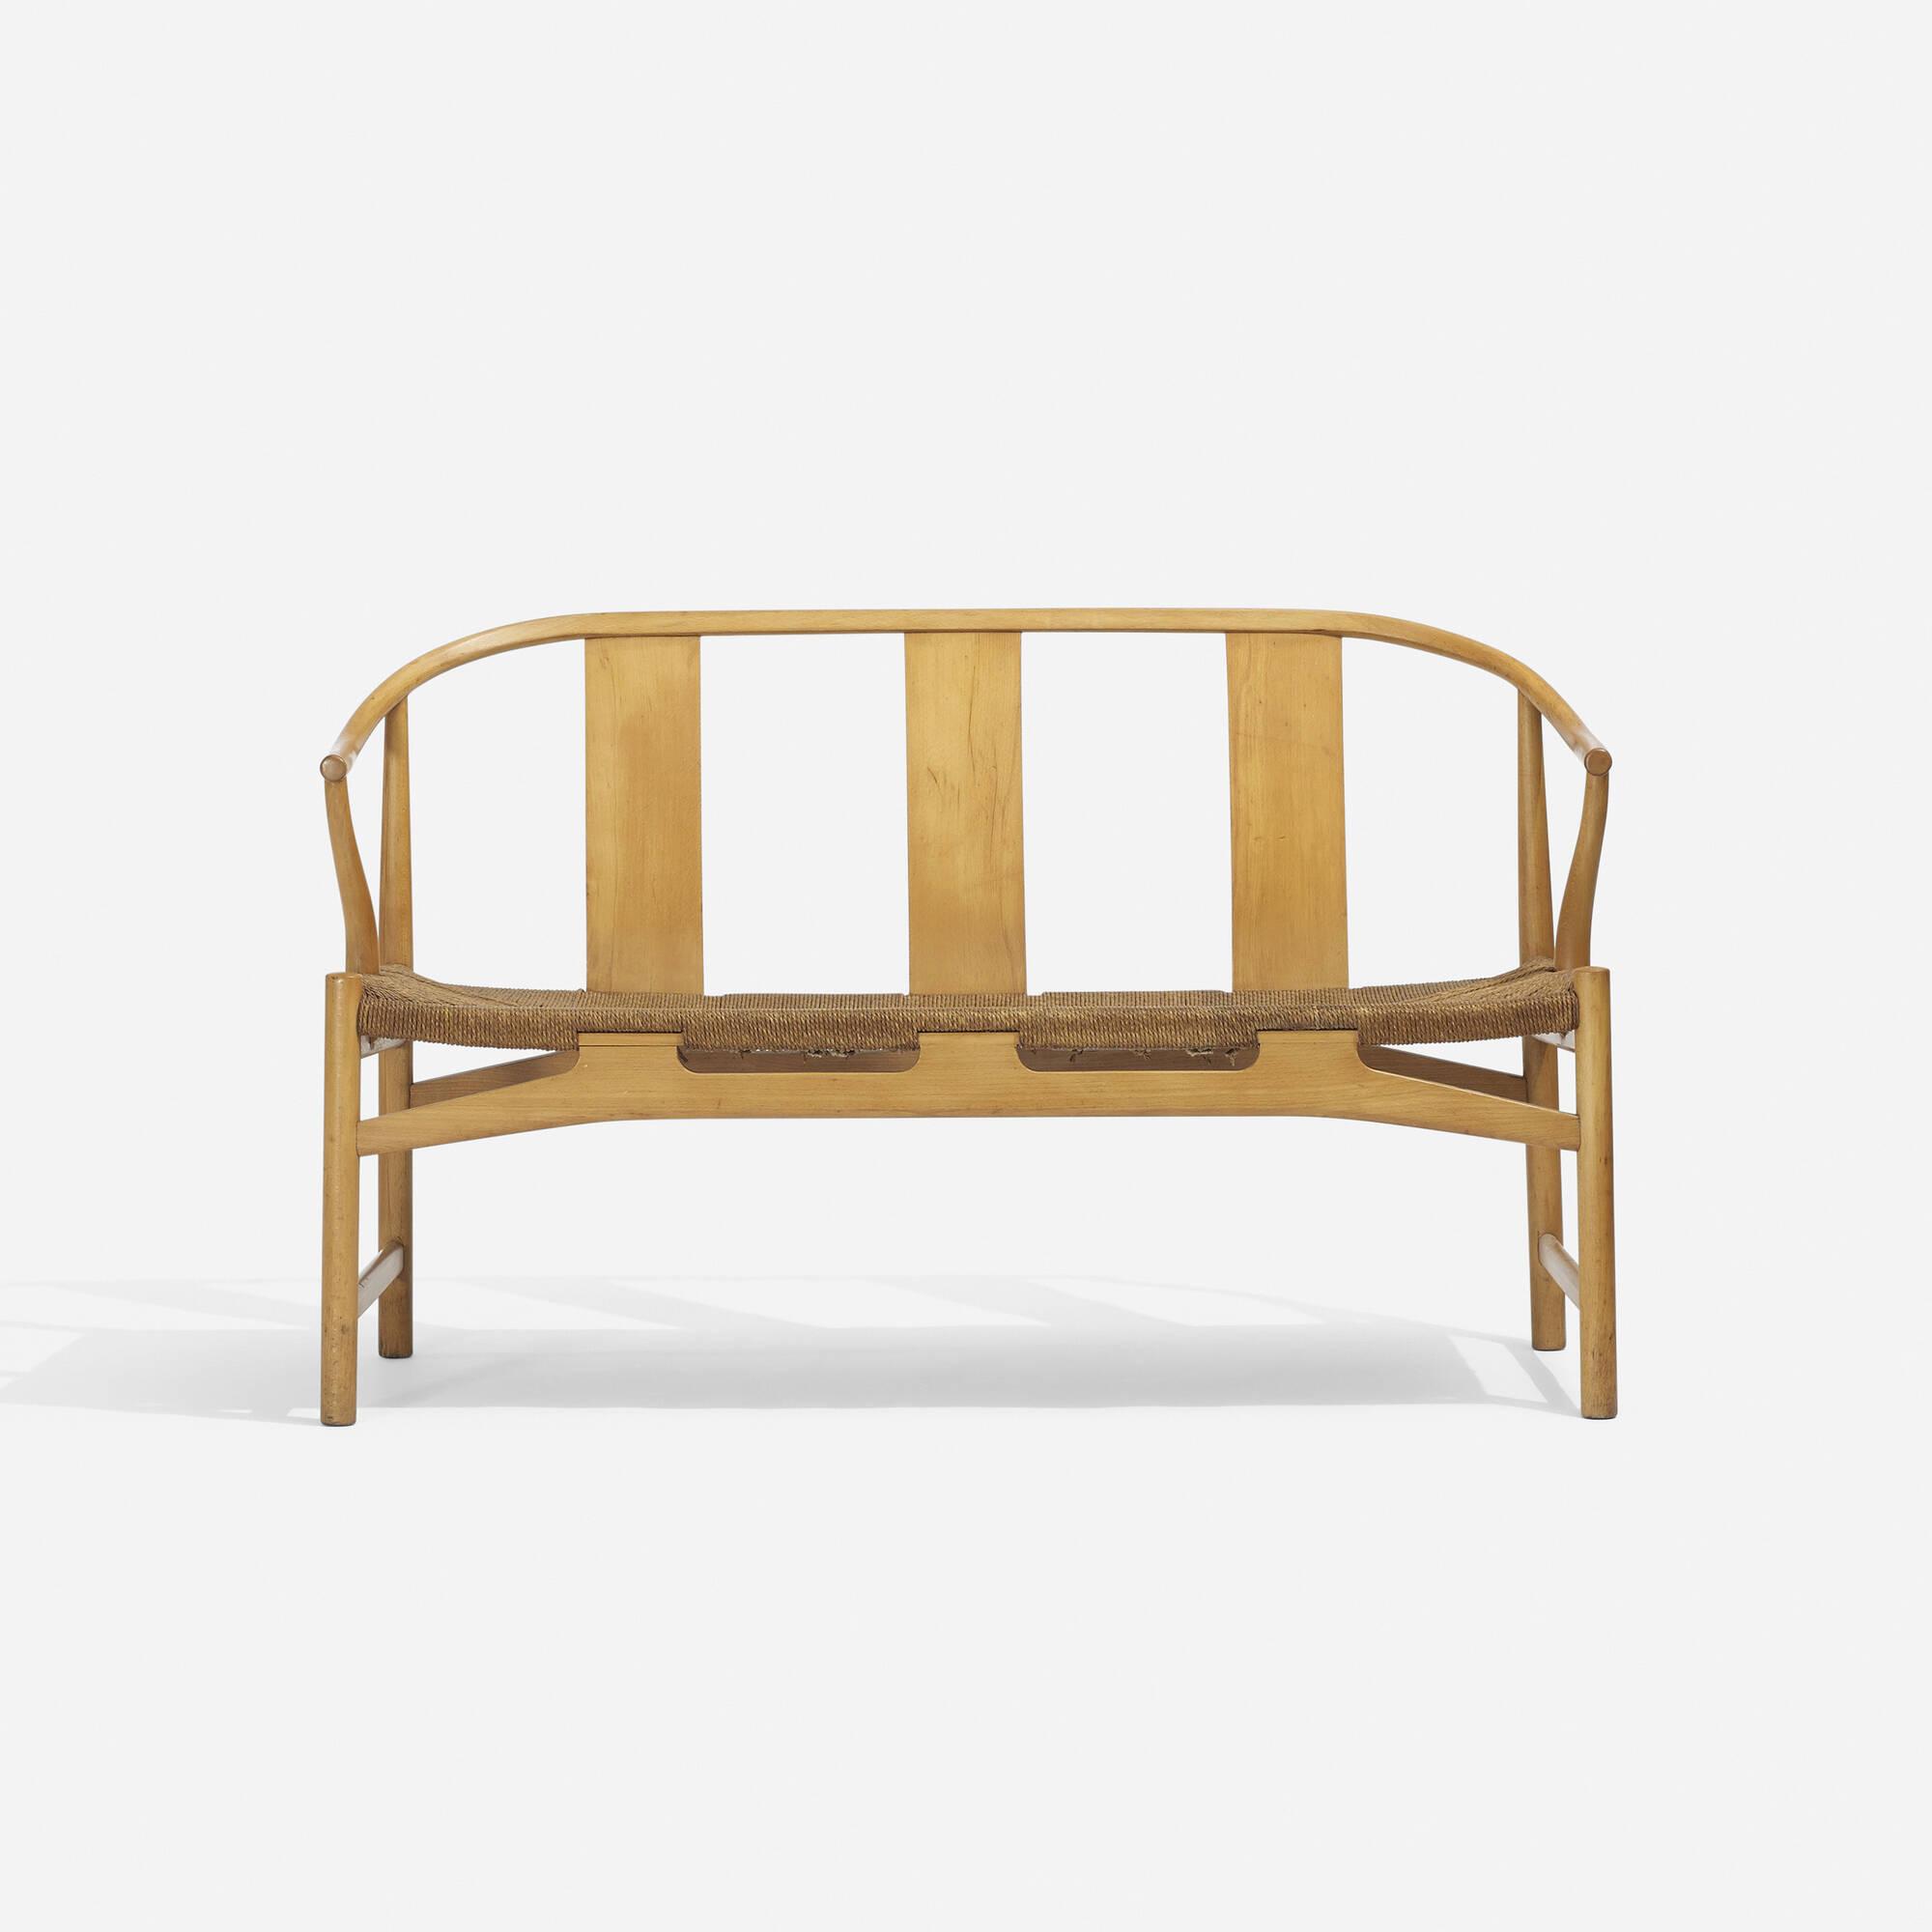 197 hans j wegner chinese settee. Black Bedroom Furniture Sets. Home Design Ideas